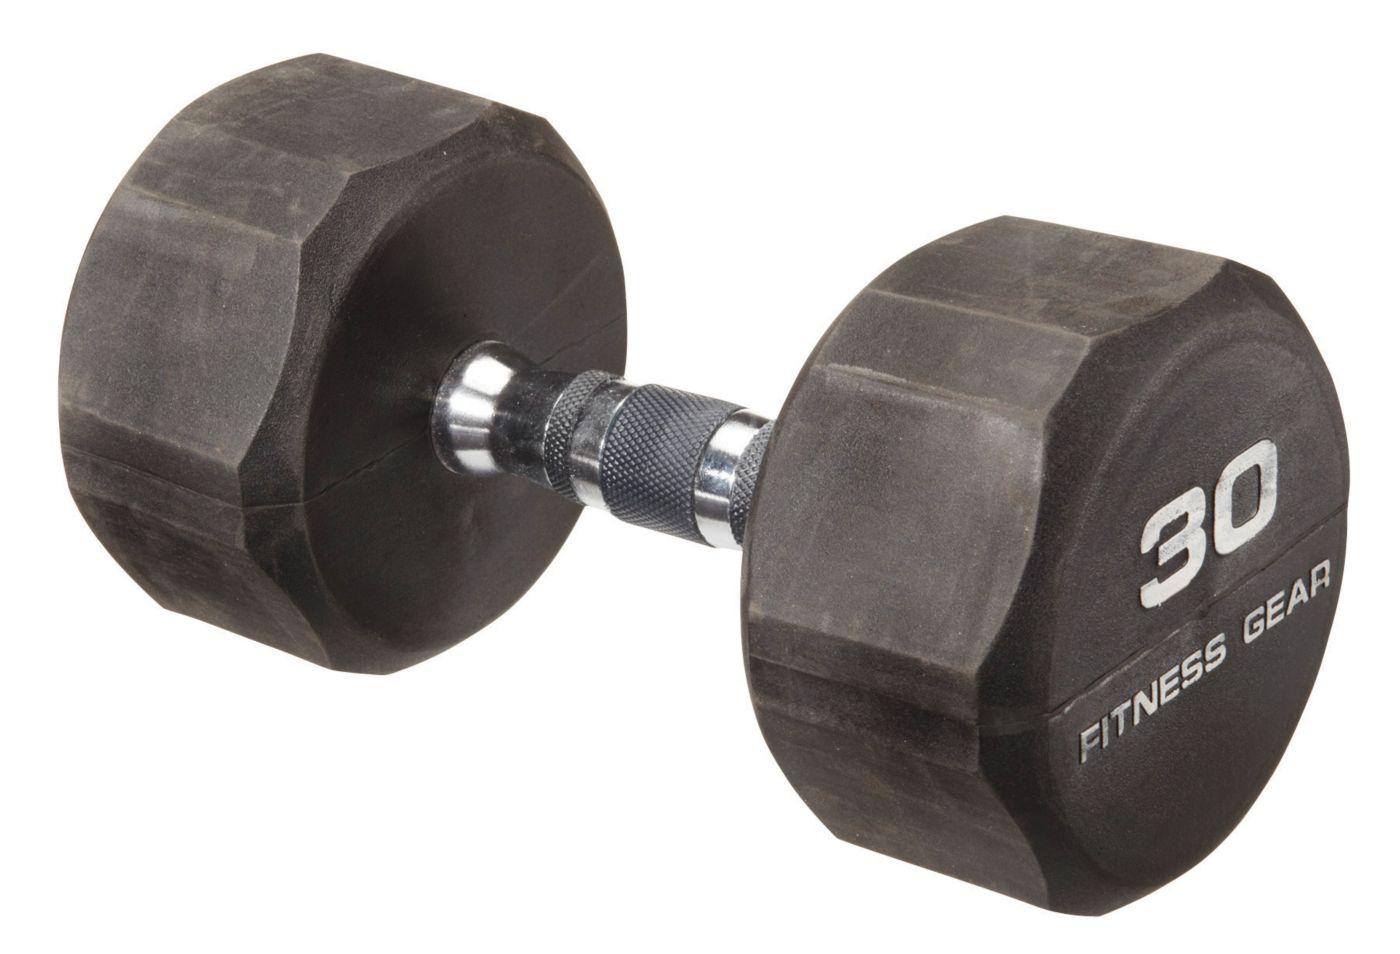 Fitness Gear 30 lb Rubber Hex Dumbbell